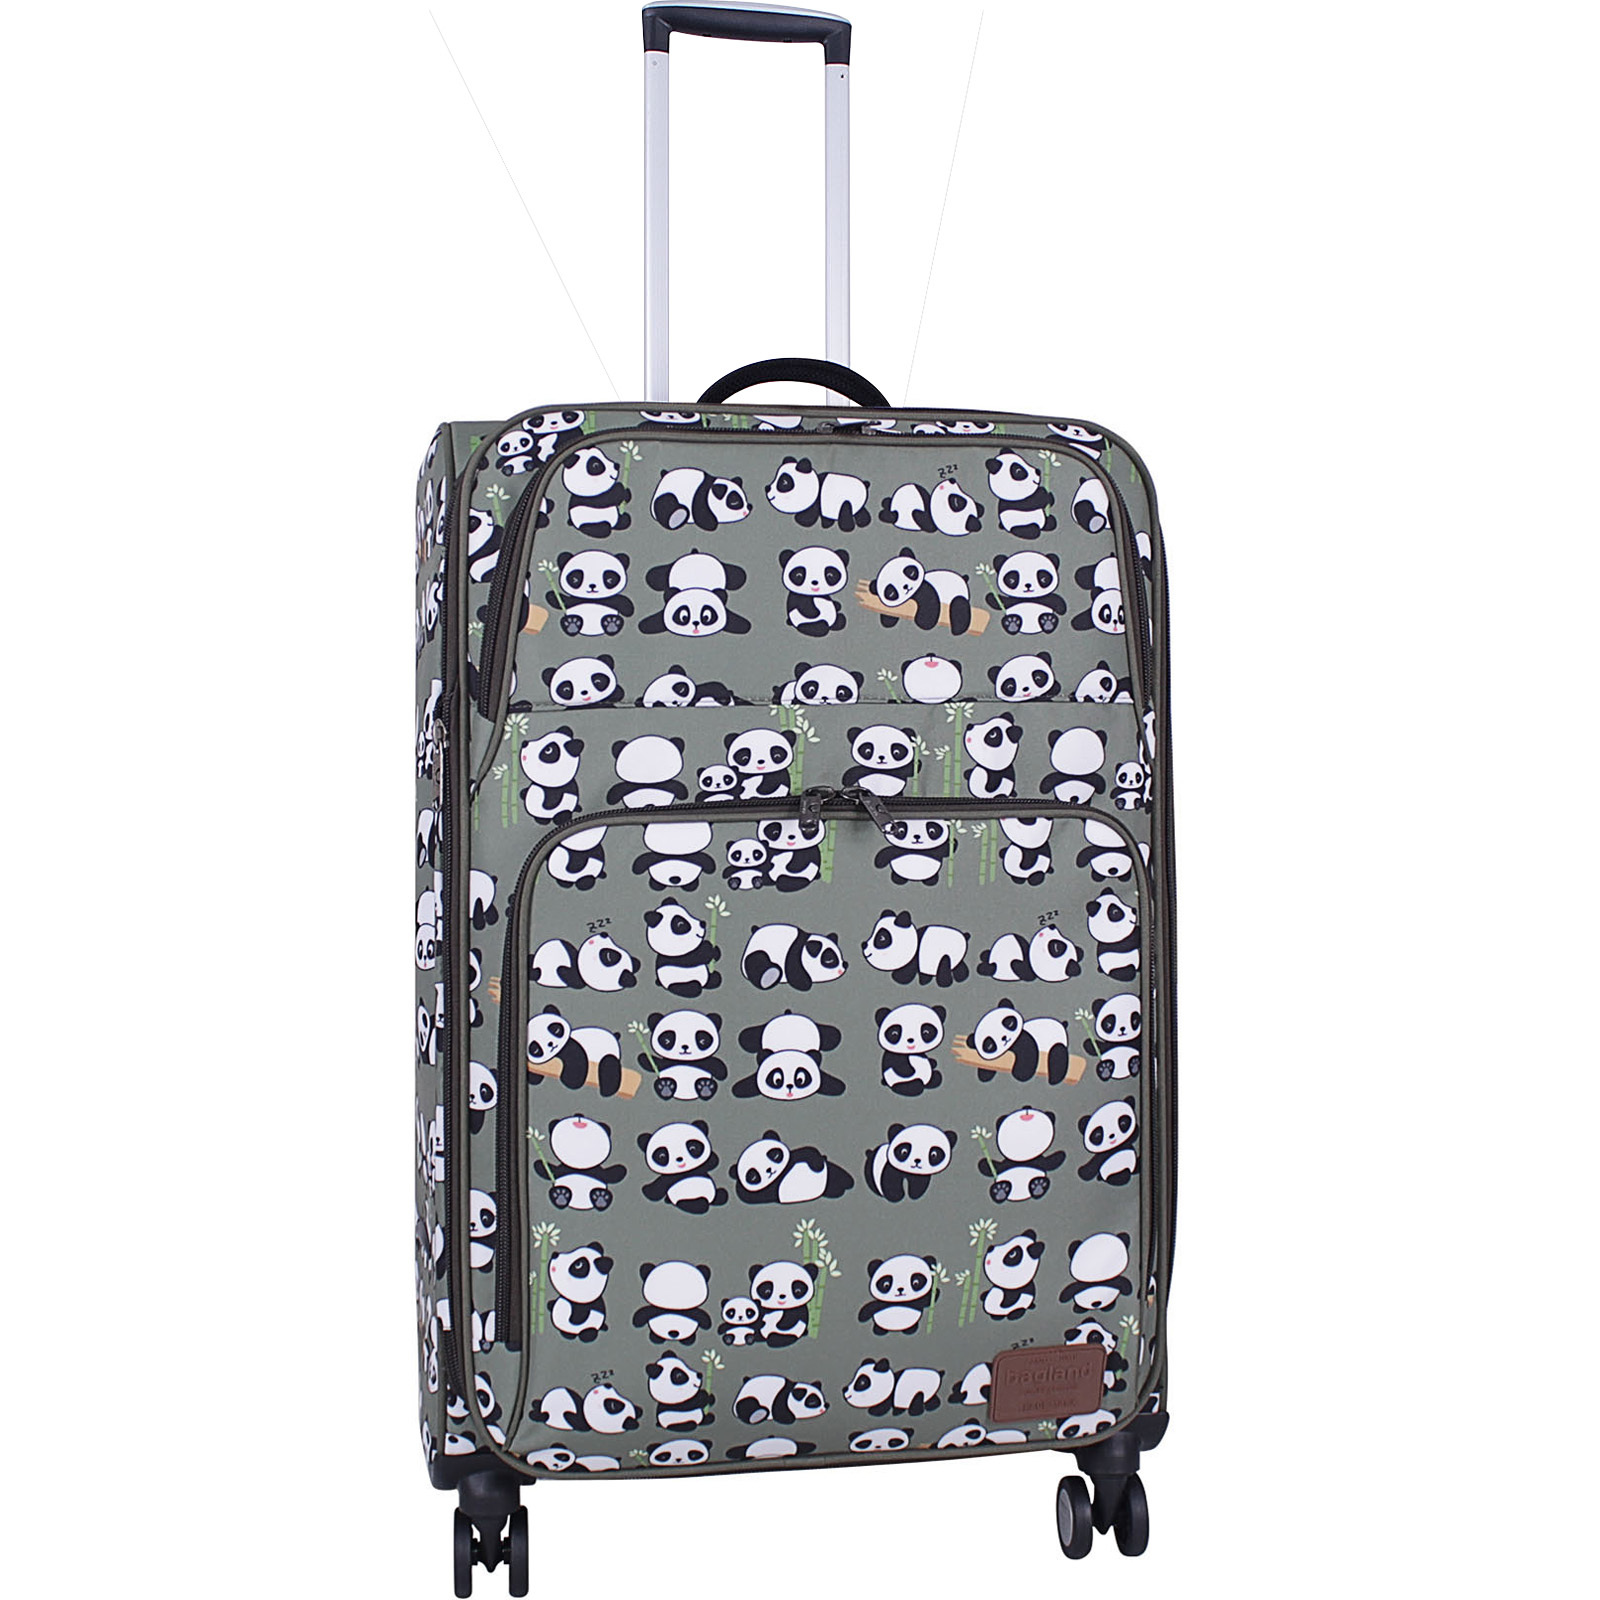 Дорожные чемоданы Чемодан Bagland Валенсия большой дизайн 83л. сублімація 755 (0037966274) IMG_8740_суб.755_-1600.jpg